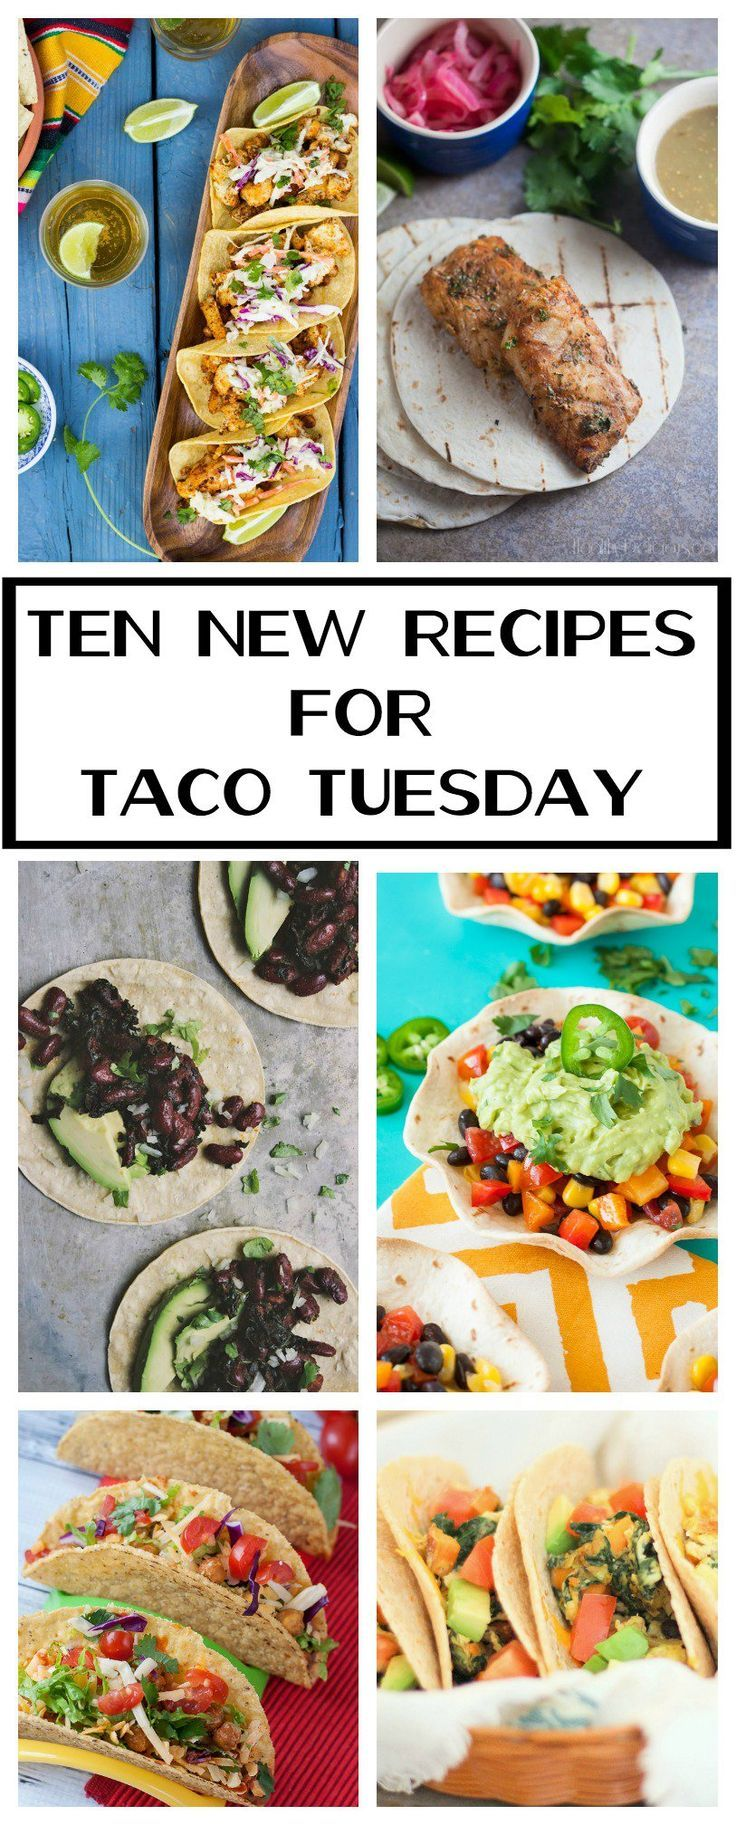 10 New Recipe Ideas for Taco Tuesday